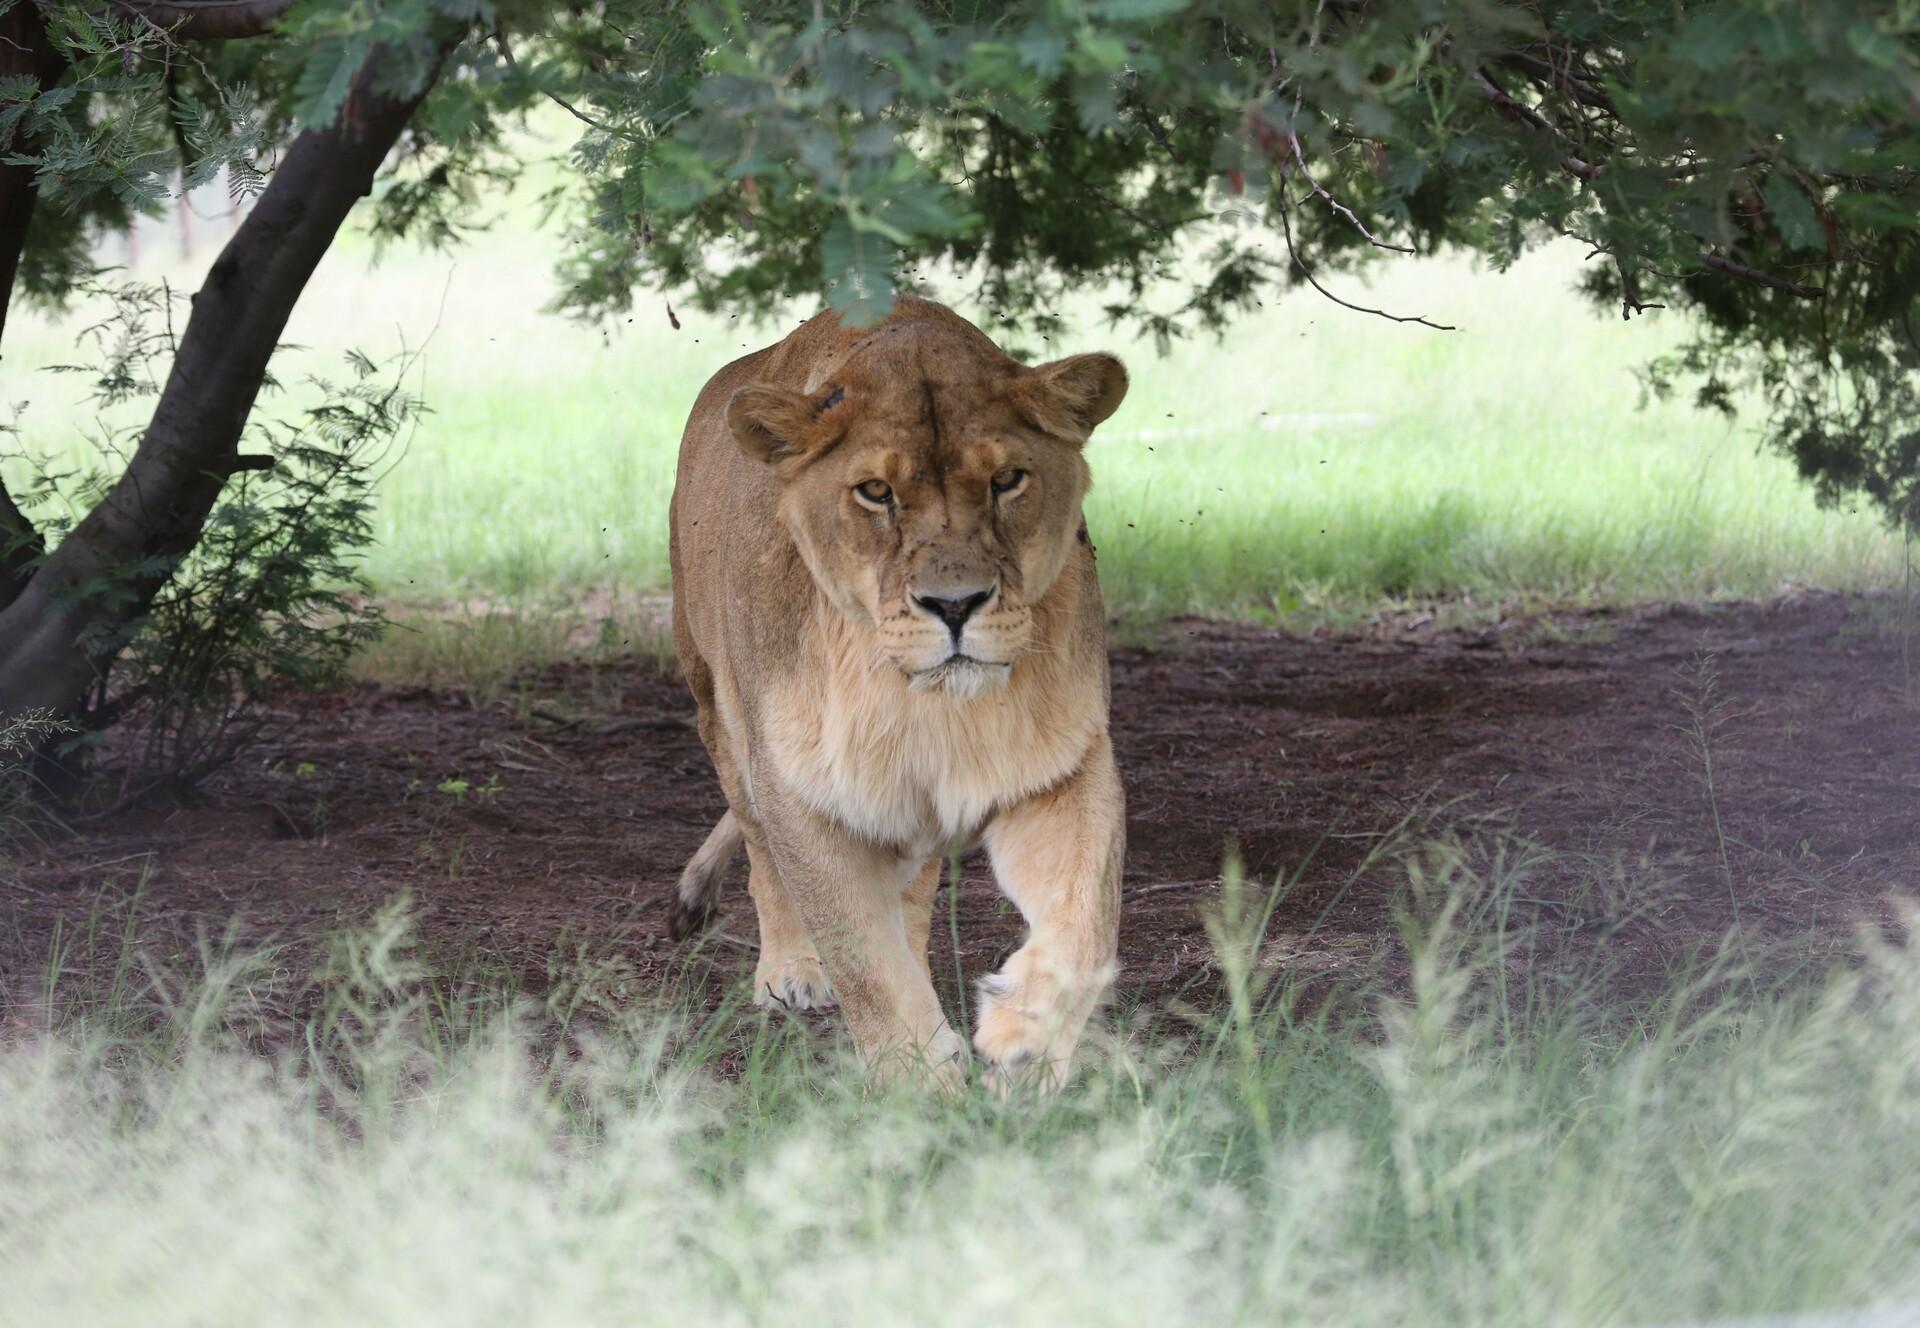 Leeuw Pregan in LIONSROCK